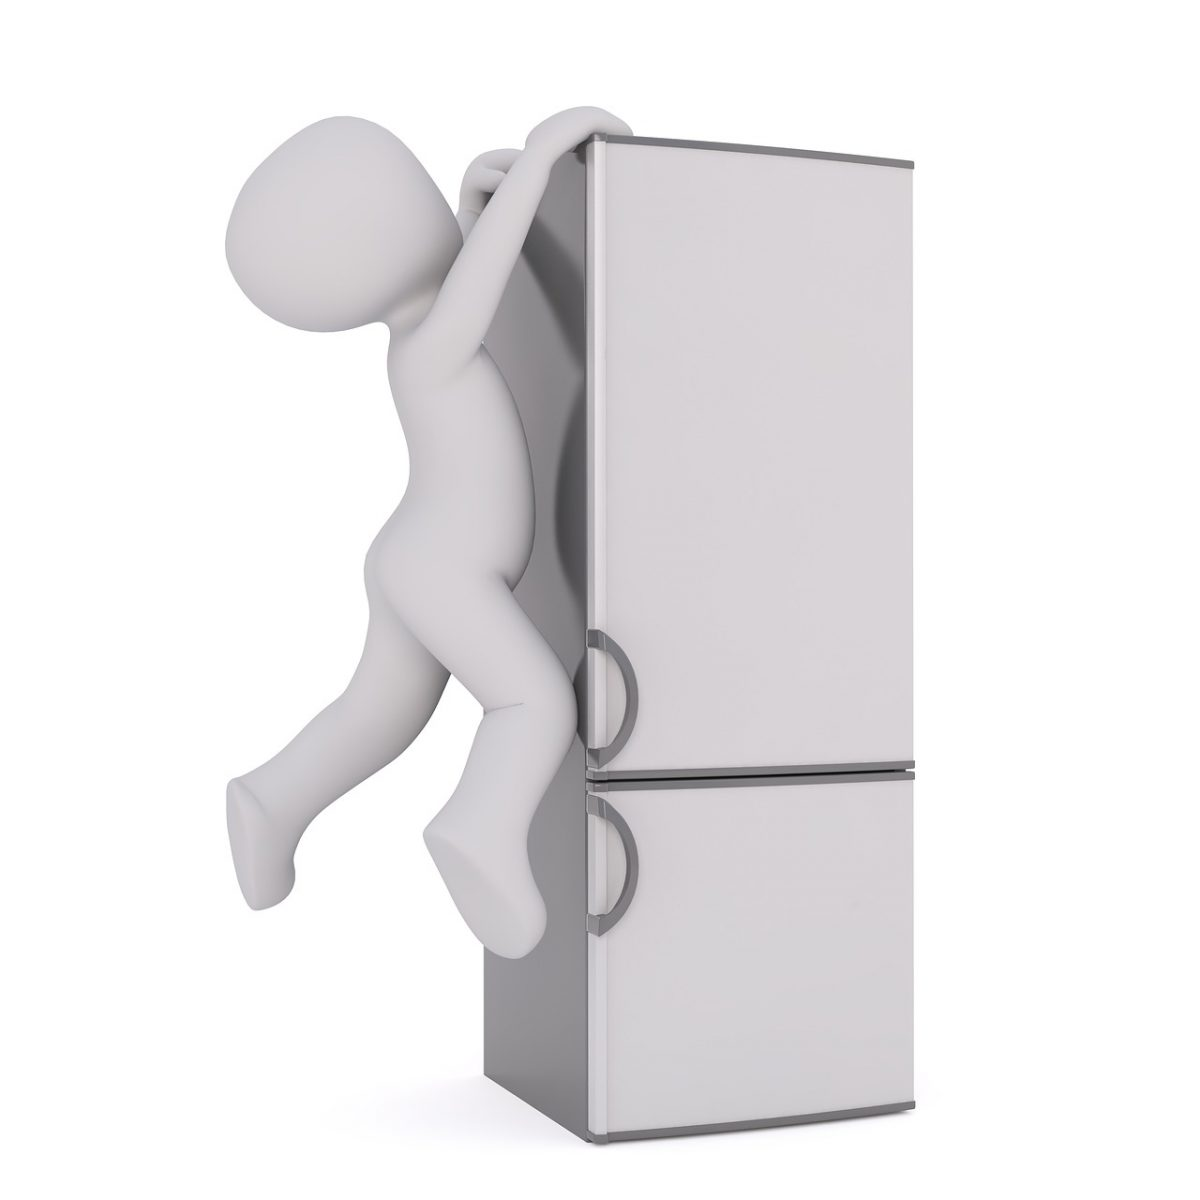 refrigerator-1889072_1280-1200x1200.jpg